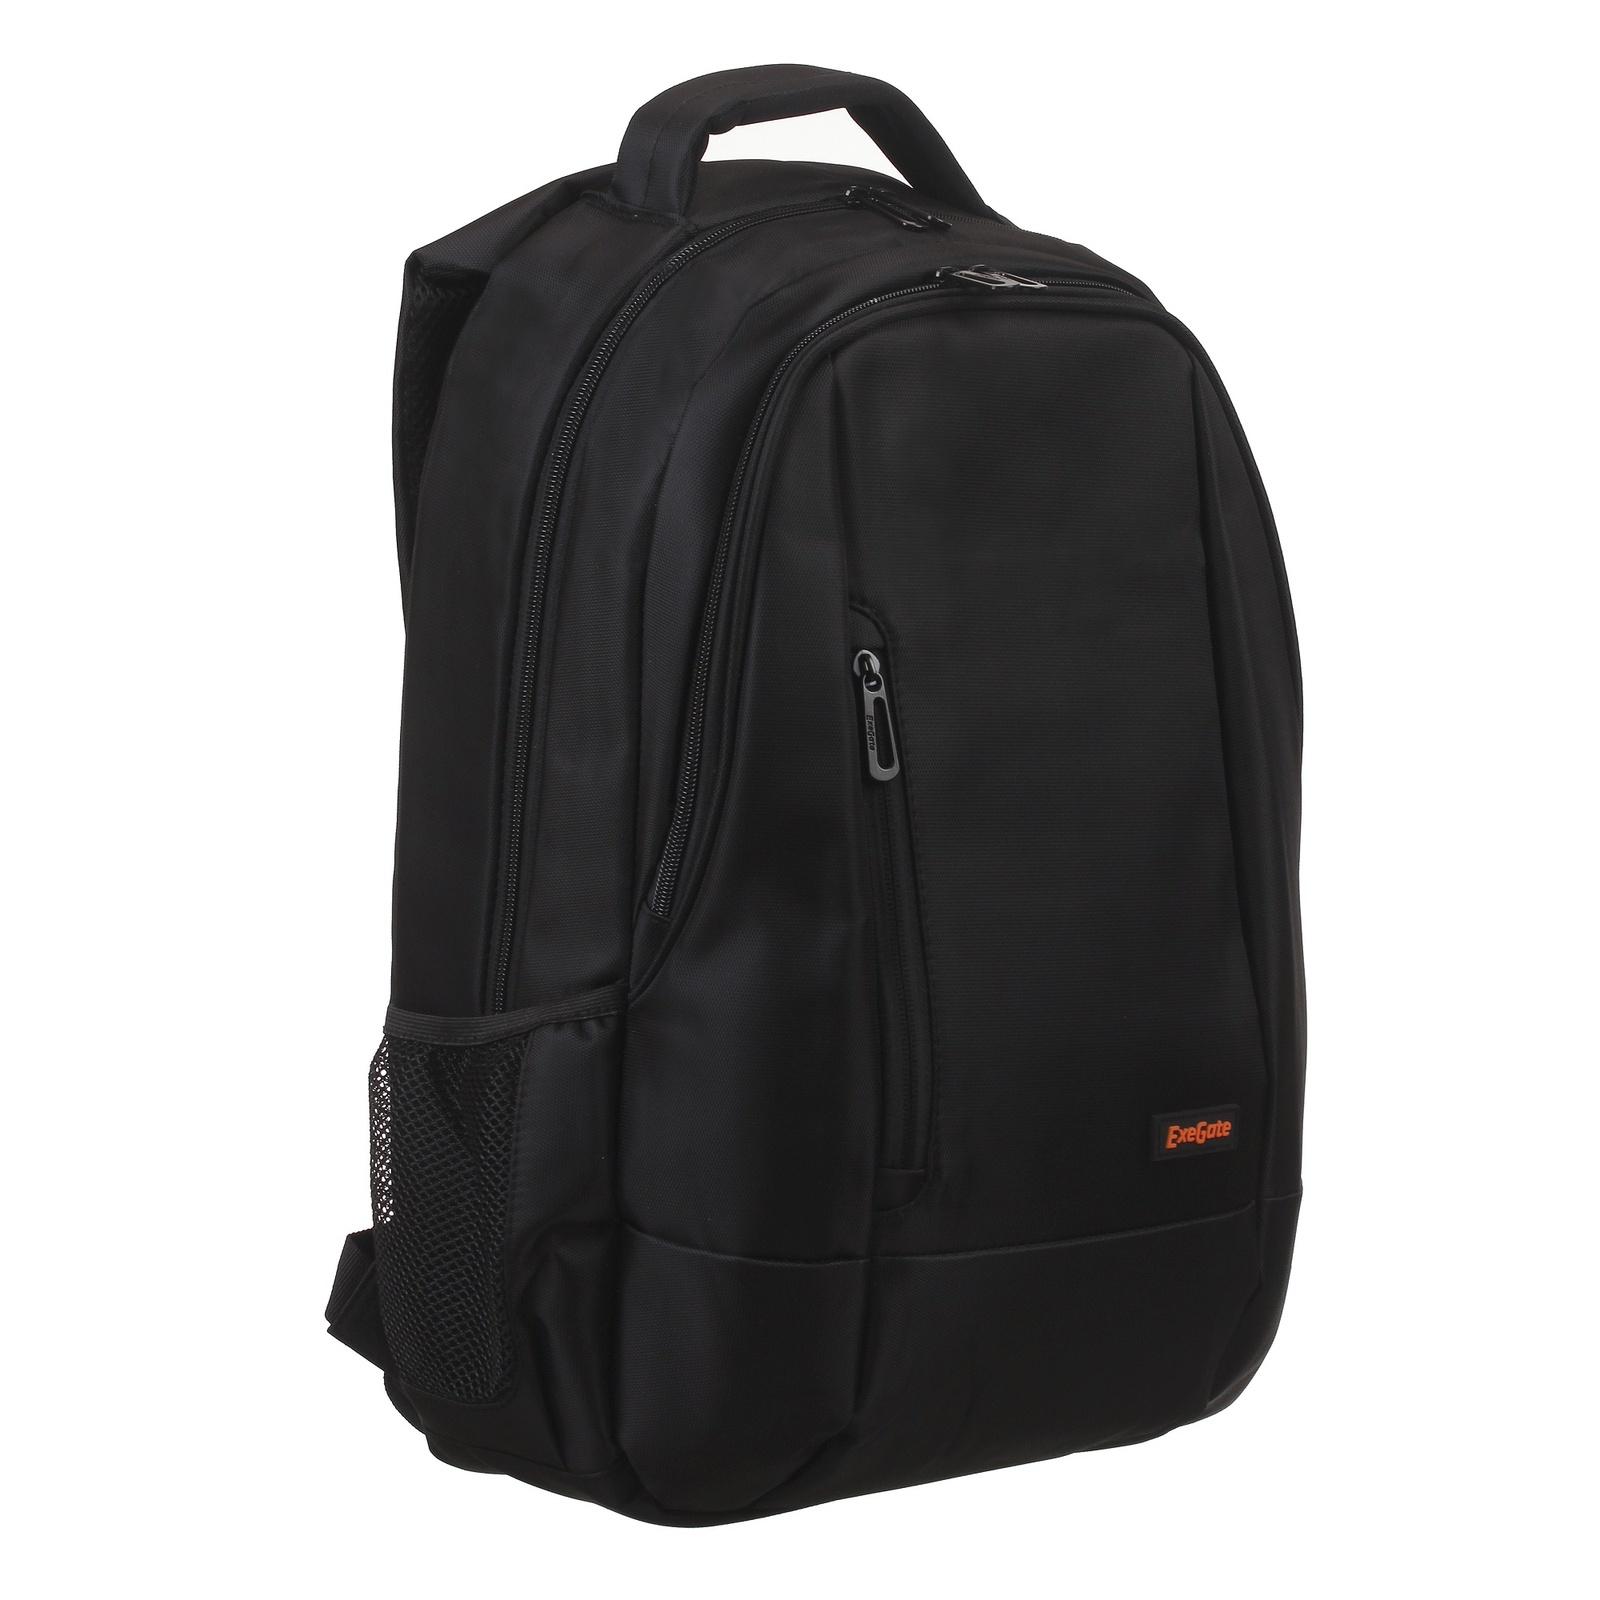 Рюкзак Exegate Office PRO B1597 Black, water resistant, черный, водоотталкивающий полиэстер, 15.6 аксессуар сумка 15 6 exegate office f1595 black